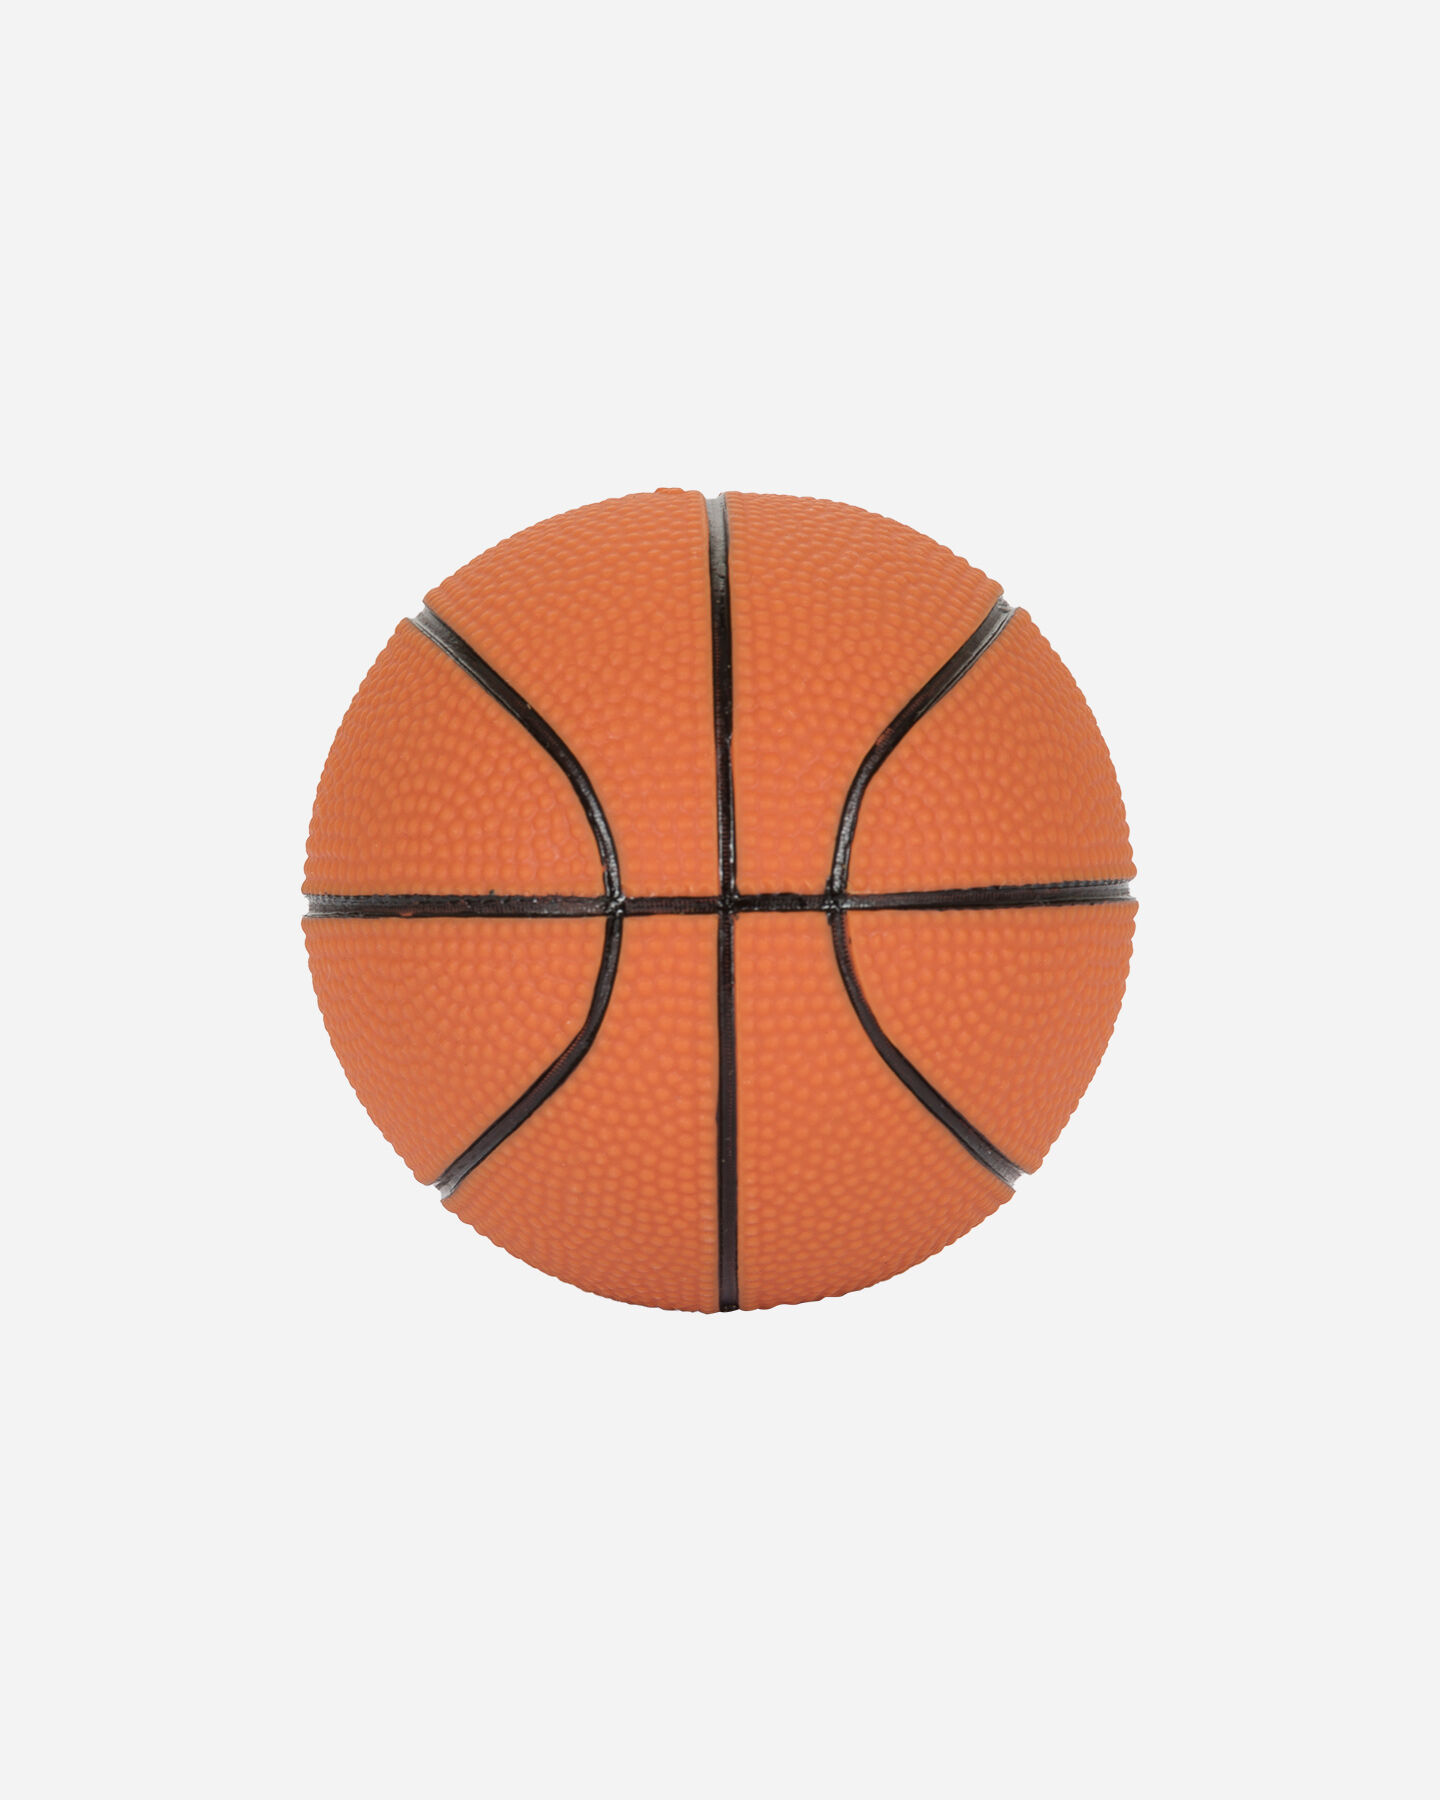 Canestro tabellone basket PRO TOUCH SET MINI BASKETBALL JR S2000104|900|- scatto 1